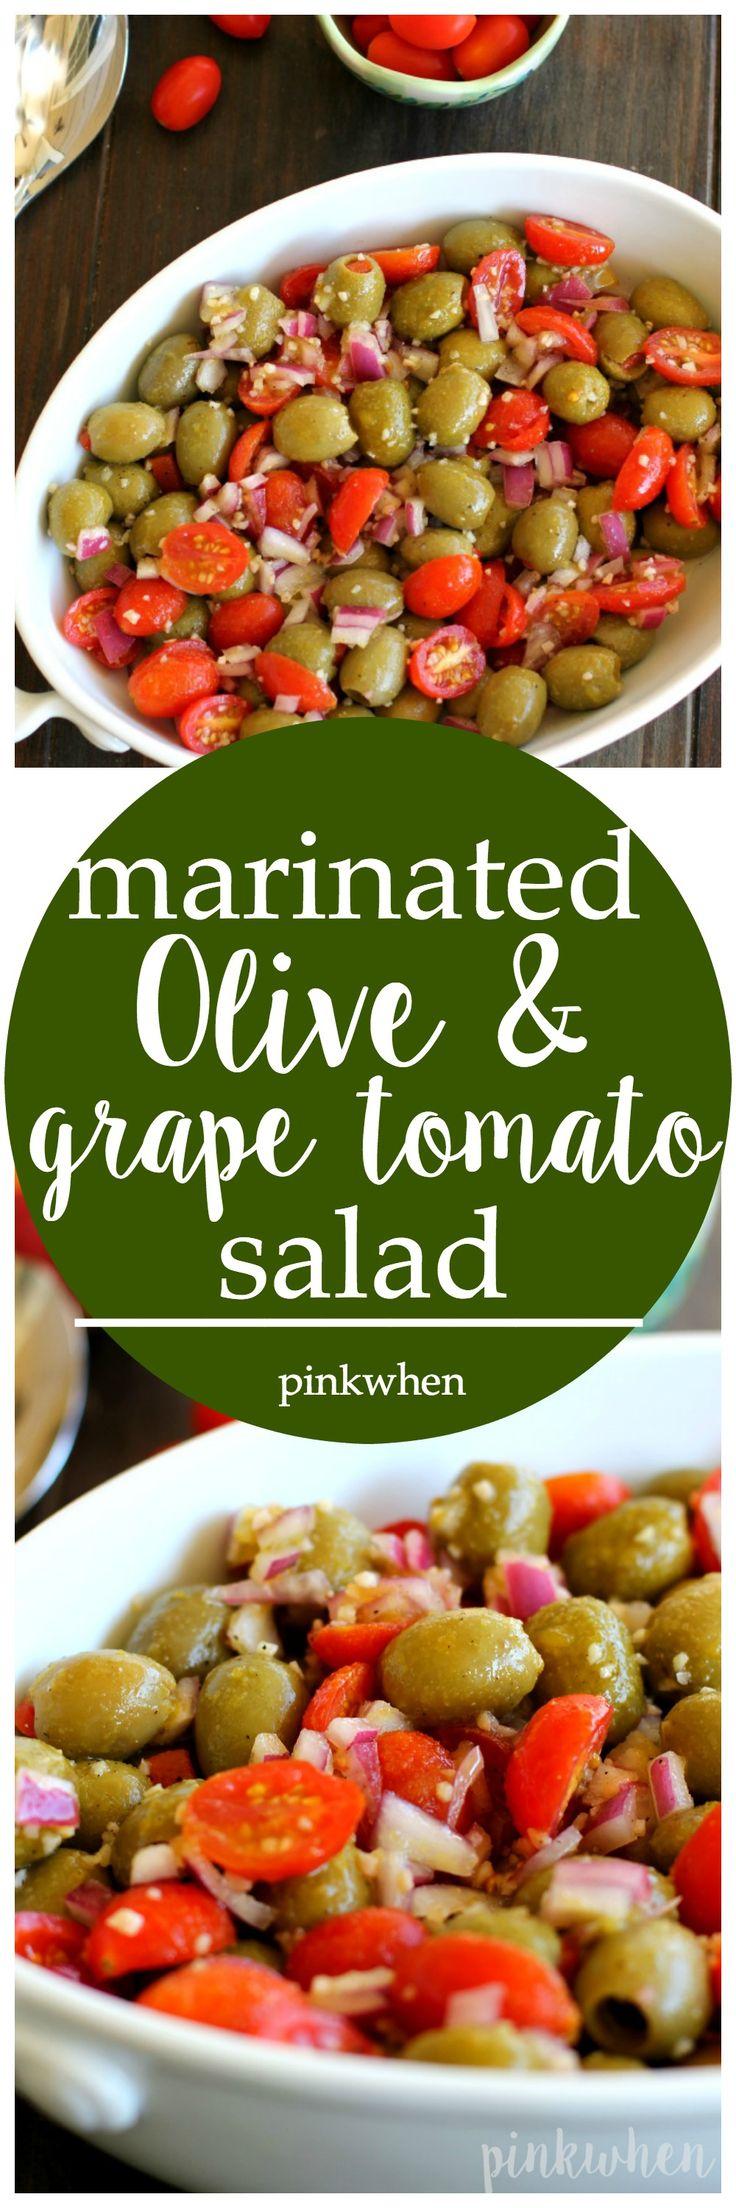 Marinated Olive and Grape Tomato Salad